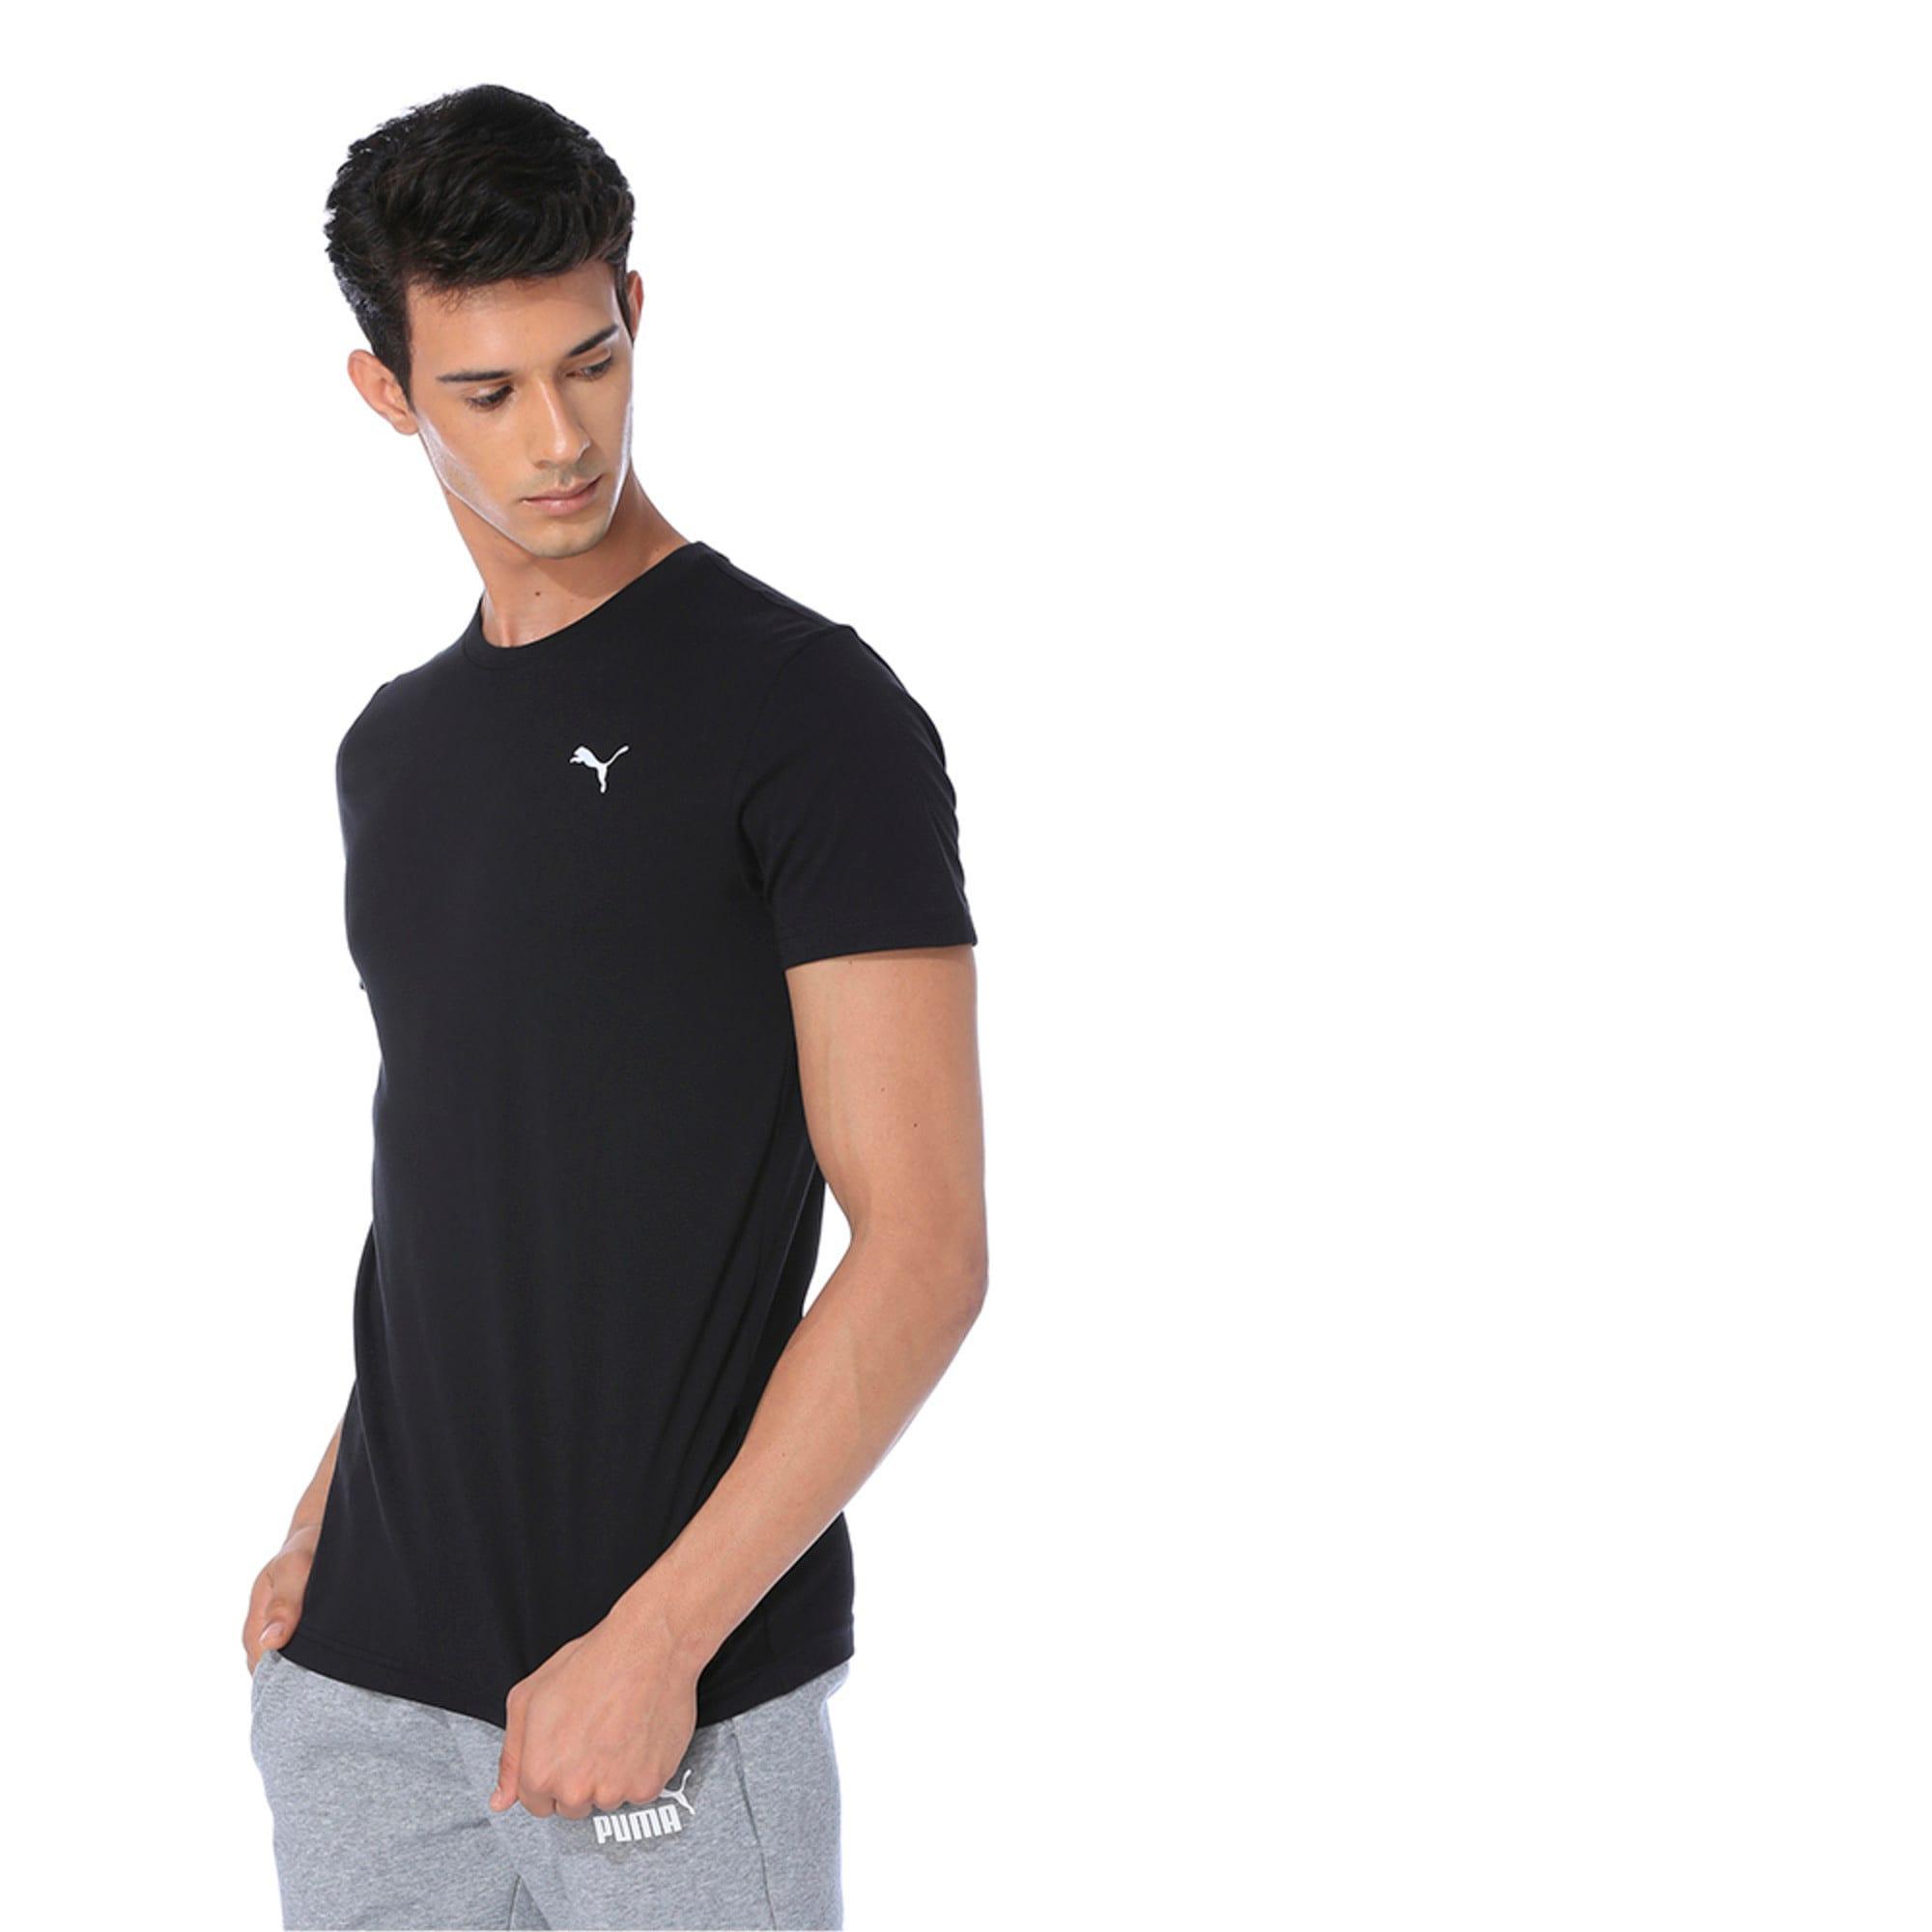 Thumbnail 4 of Men's Essentials Small Logo T-Shirt, Cotton Black, medium-IND